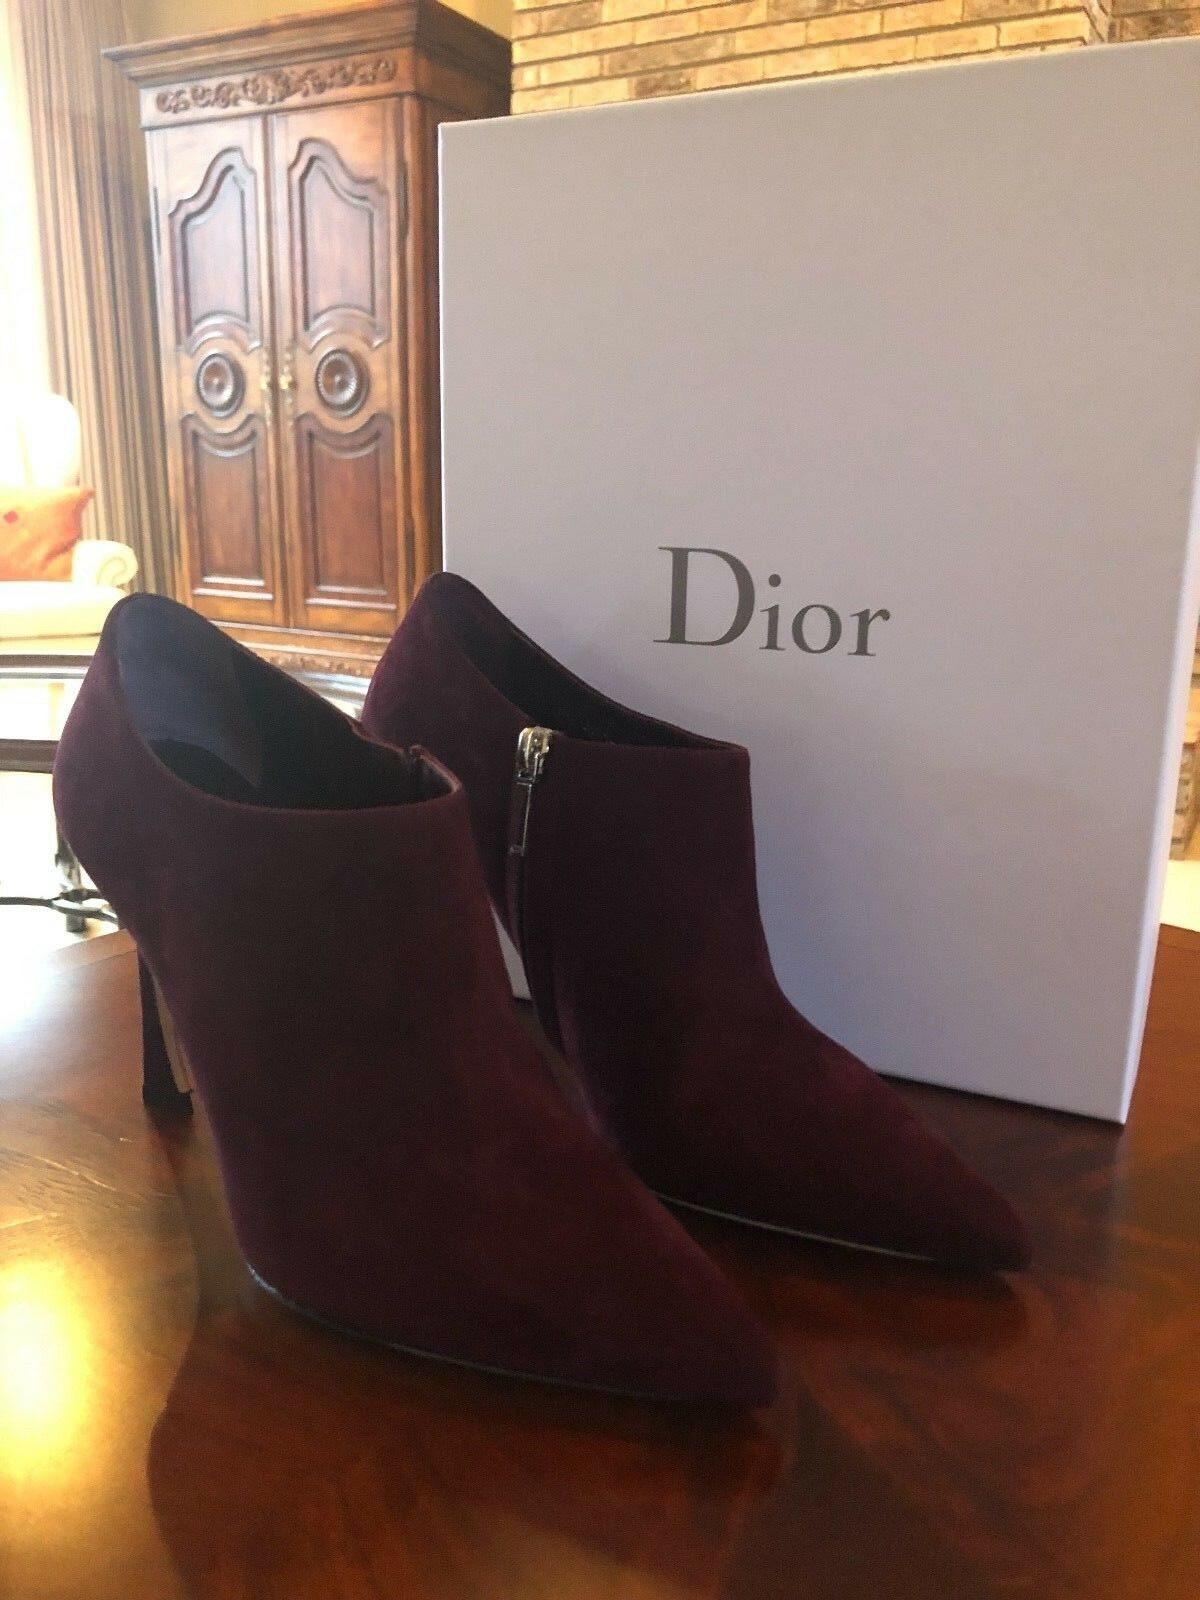 New In Box Authentic Christian Dior démarrageie Taille 39 EU EU EU  8.5 US  Burgundy Suede ffbdff